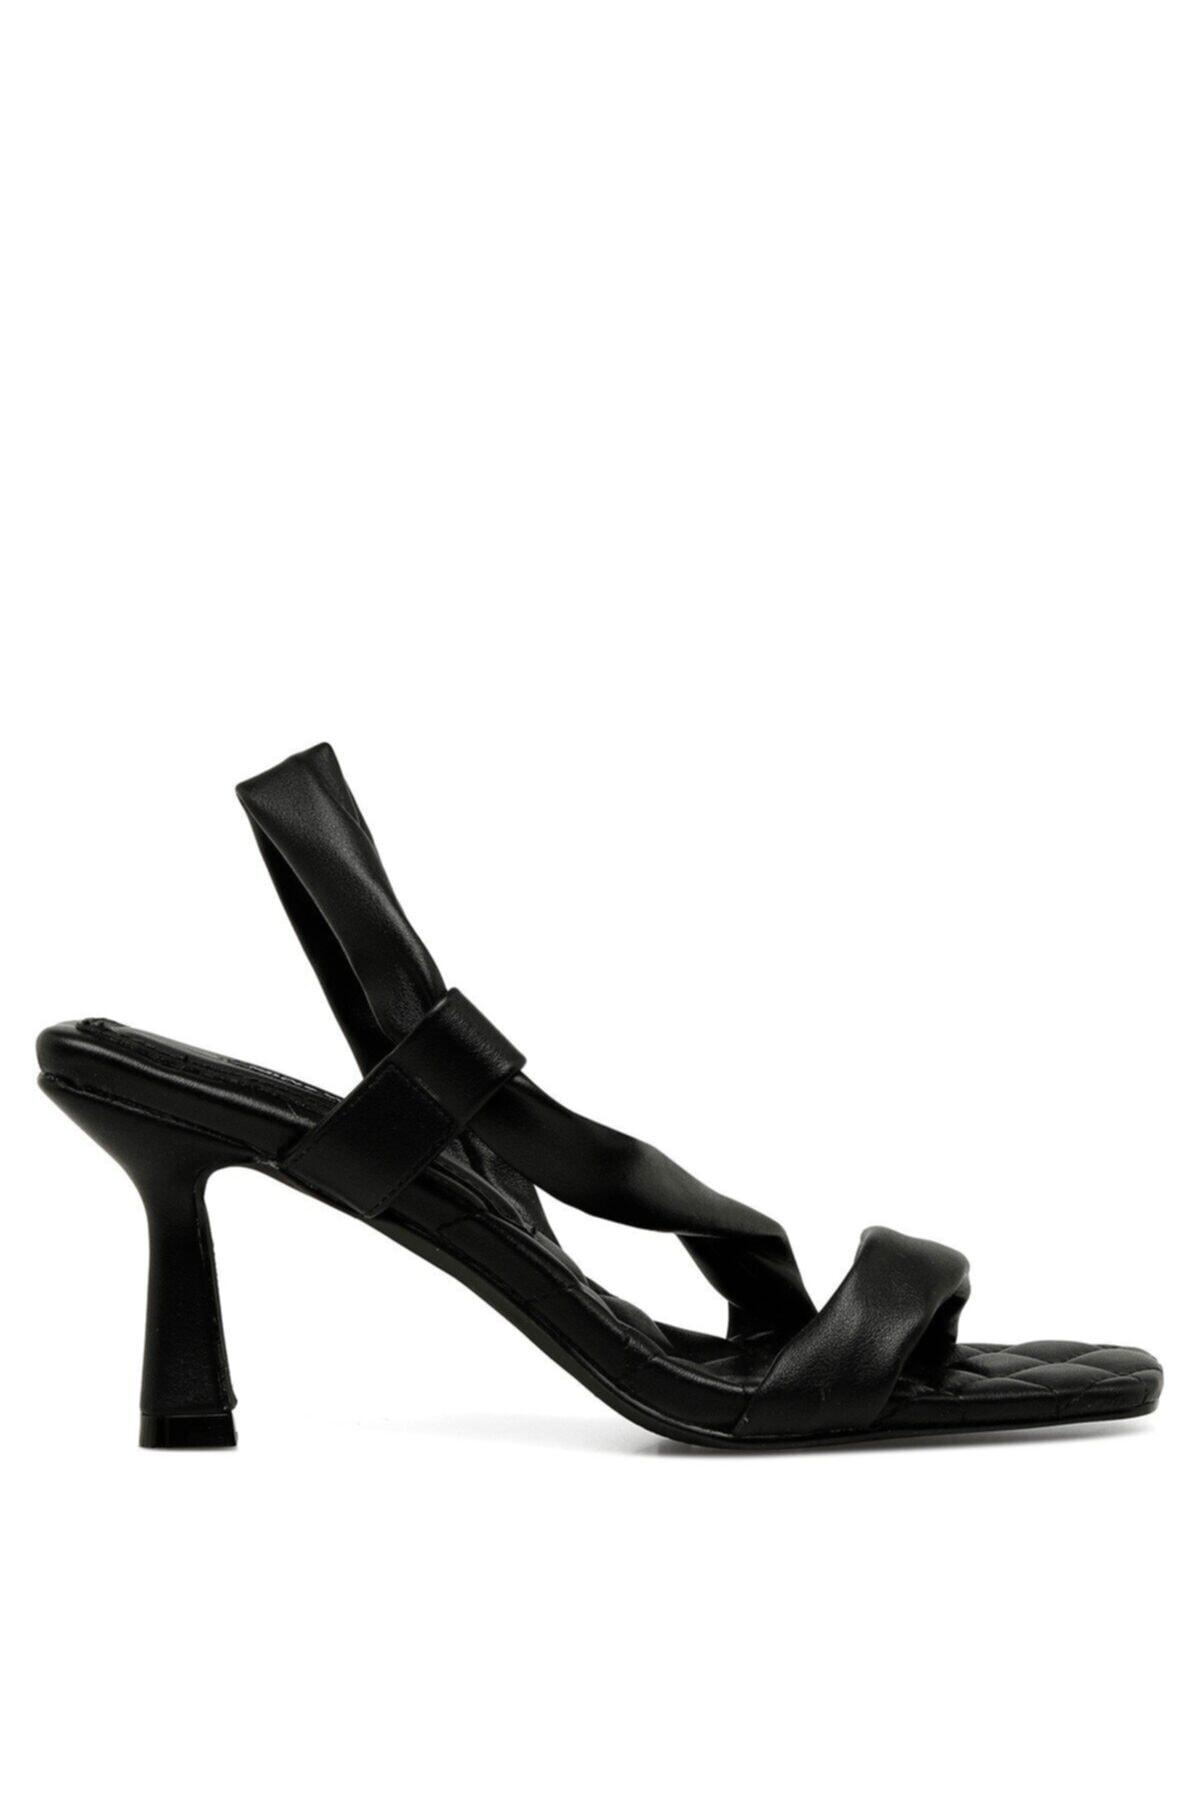 PALMER 1 FX Siyah Kadın Sandalet 101030312